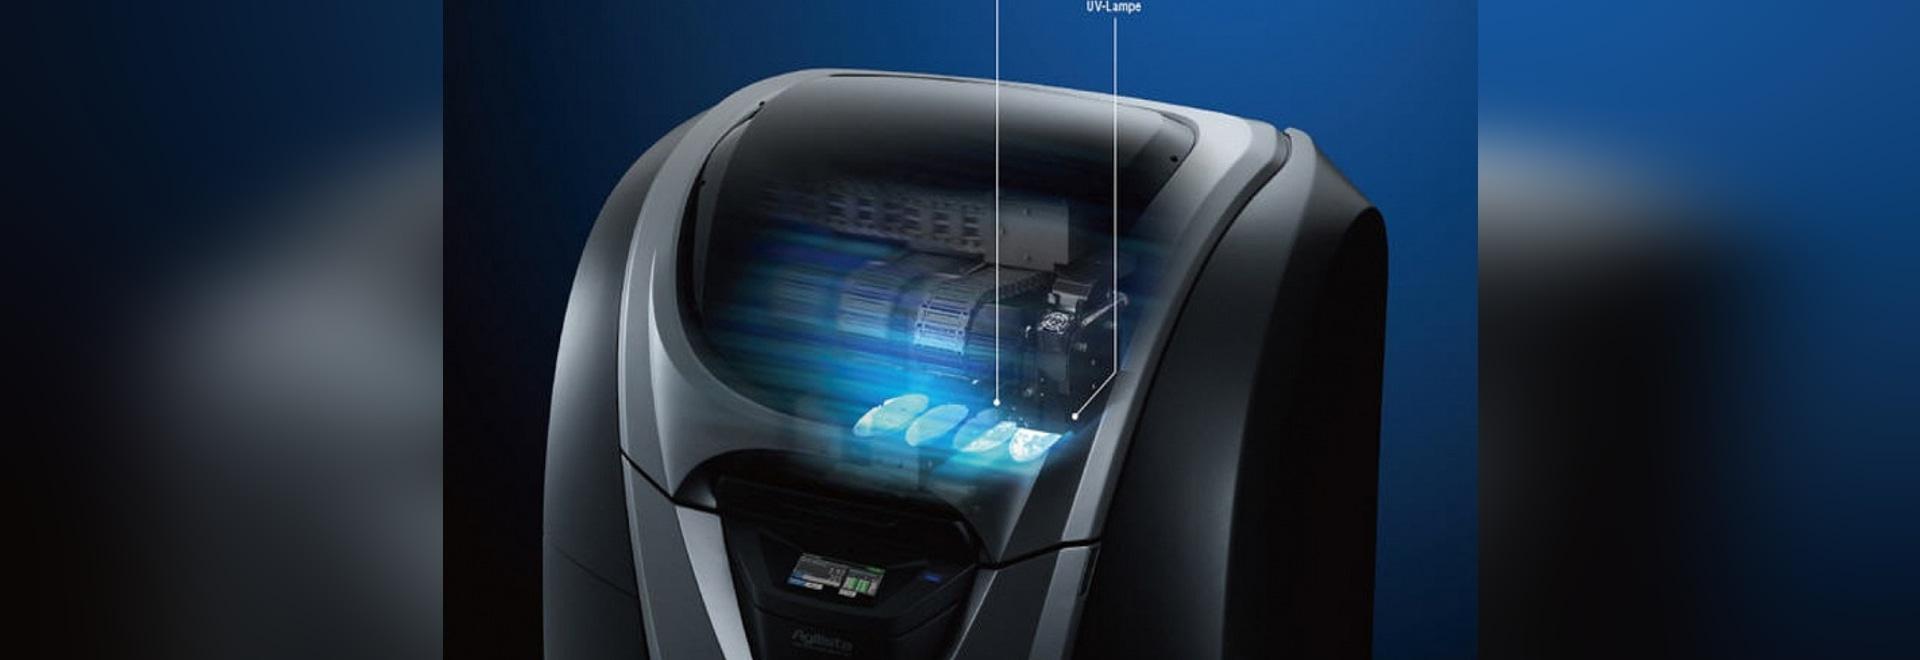 Stampante 3D di Agilista 3000: Una resistenza termica sopra 100°C